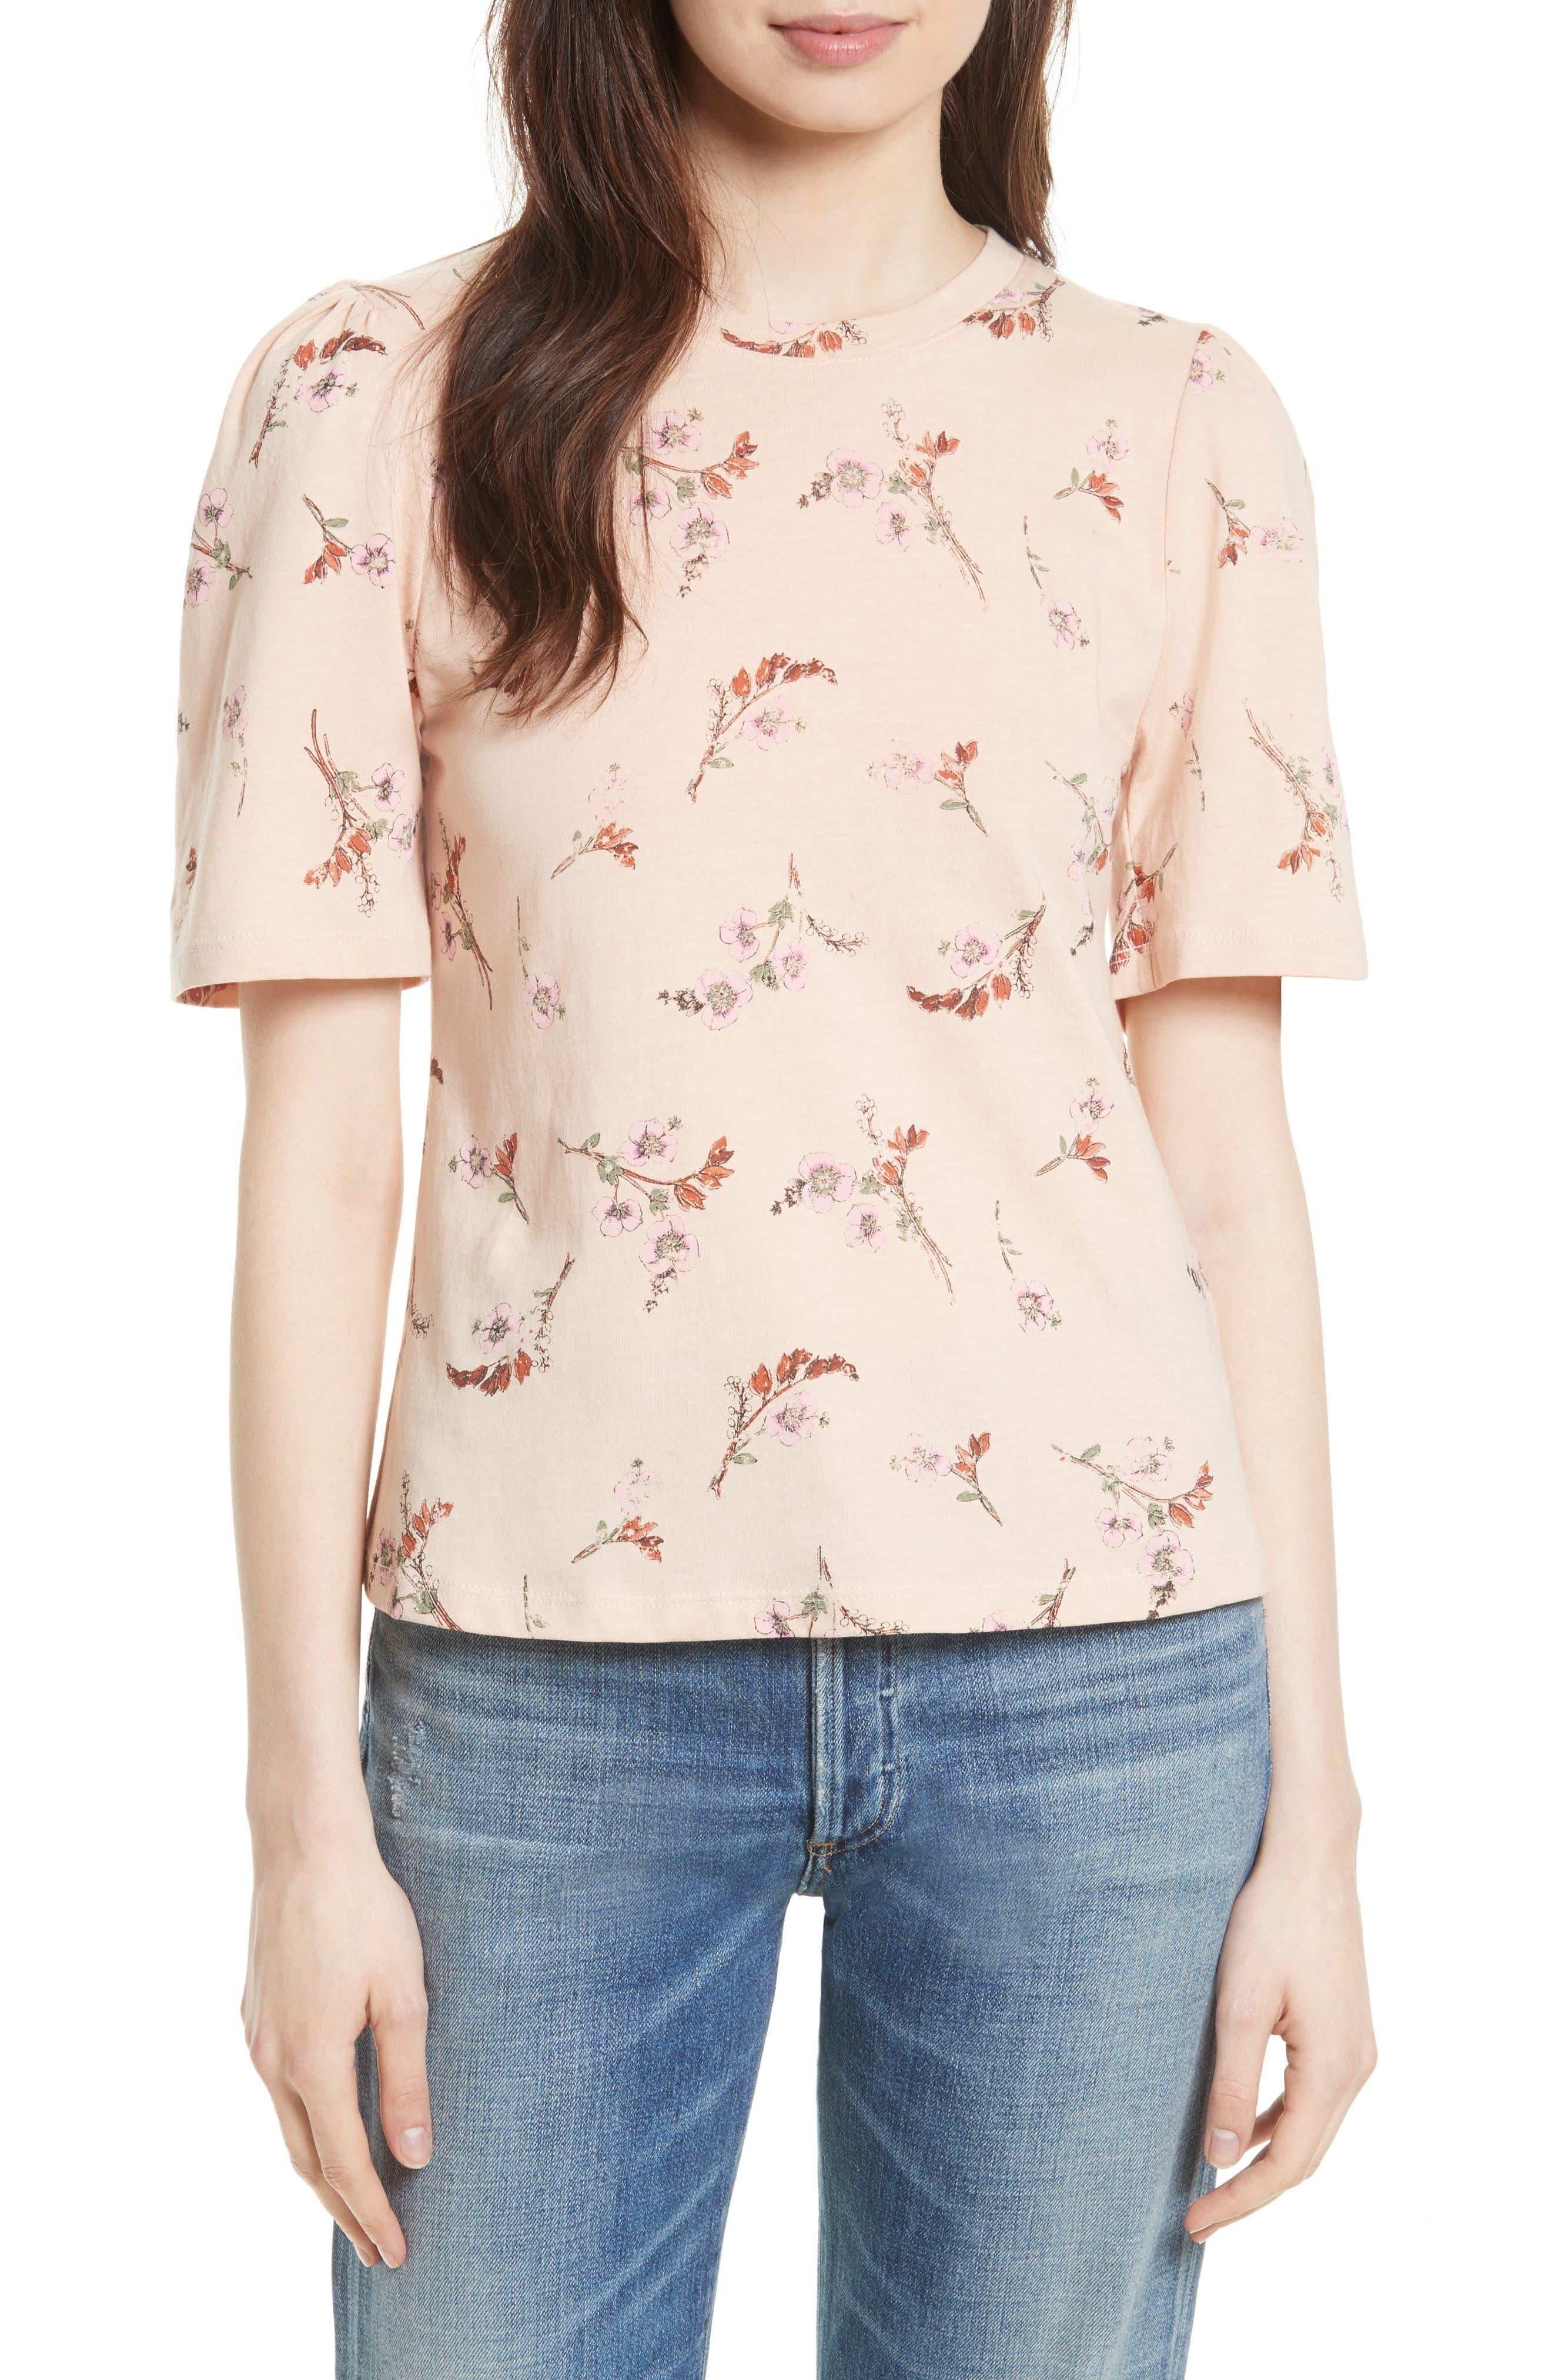 Alternate Image 1 Selected - Rebecca Taylor Natalie Fleur Cotton Jersey Top